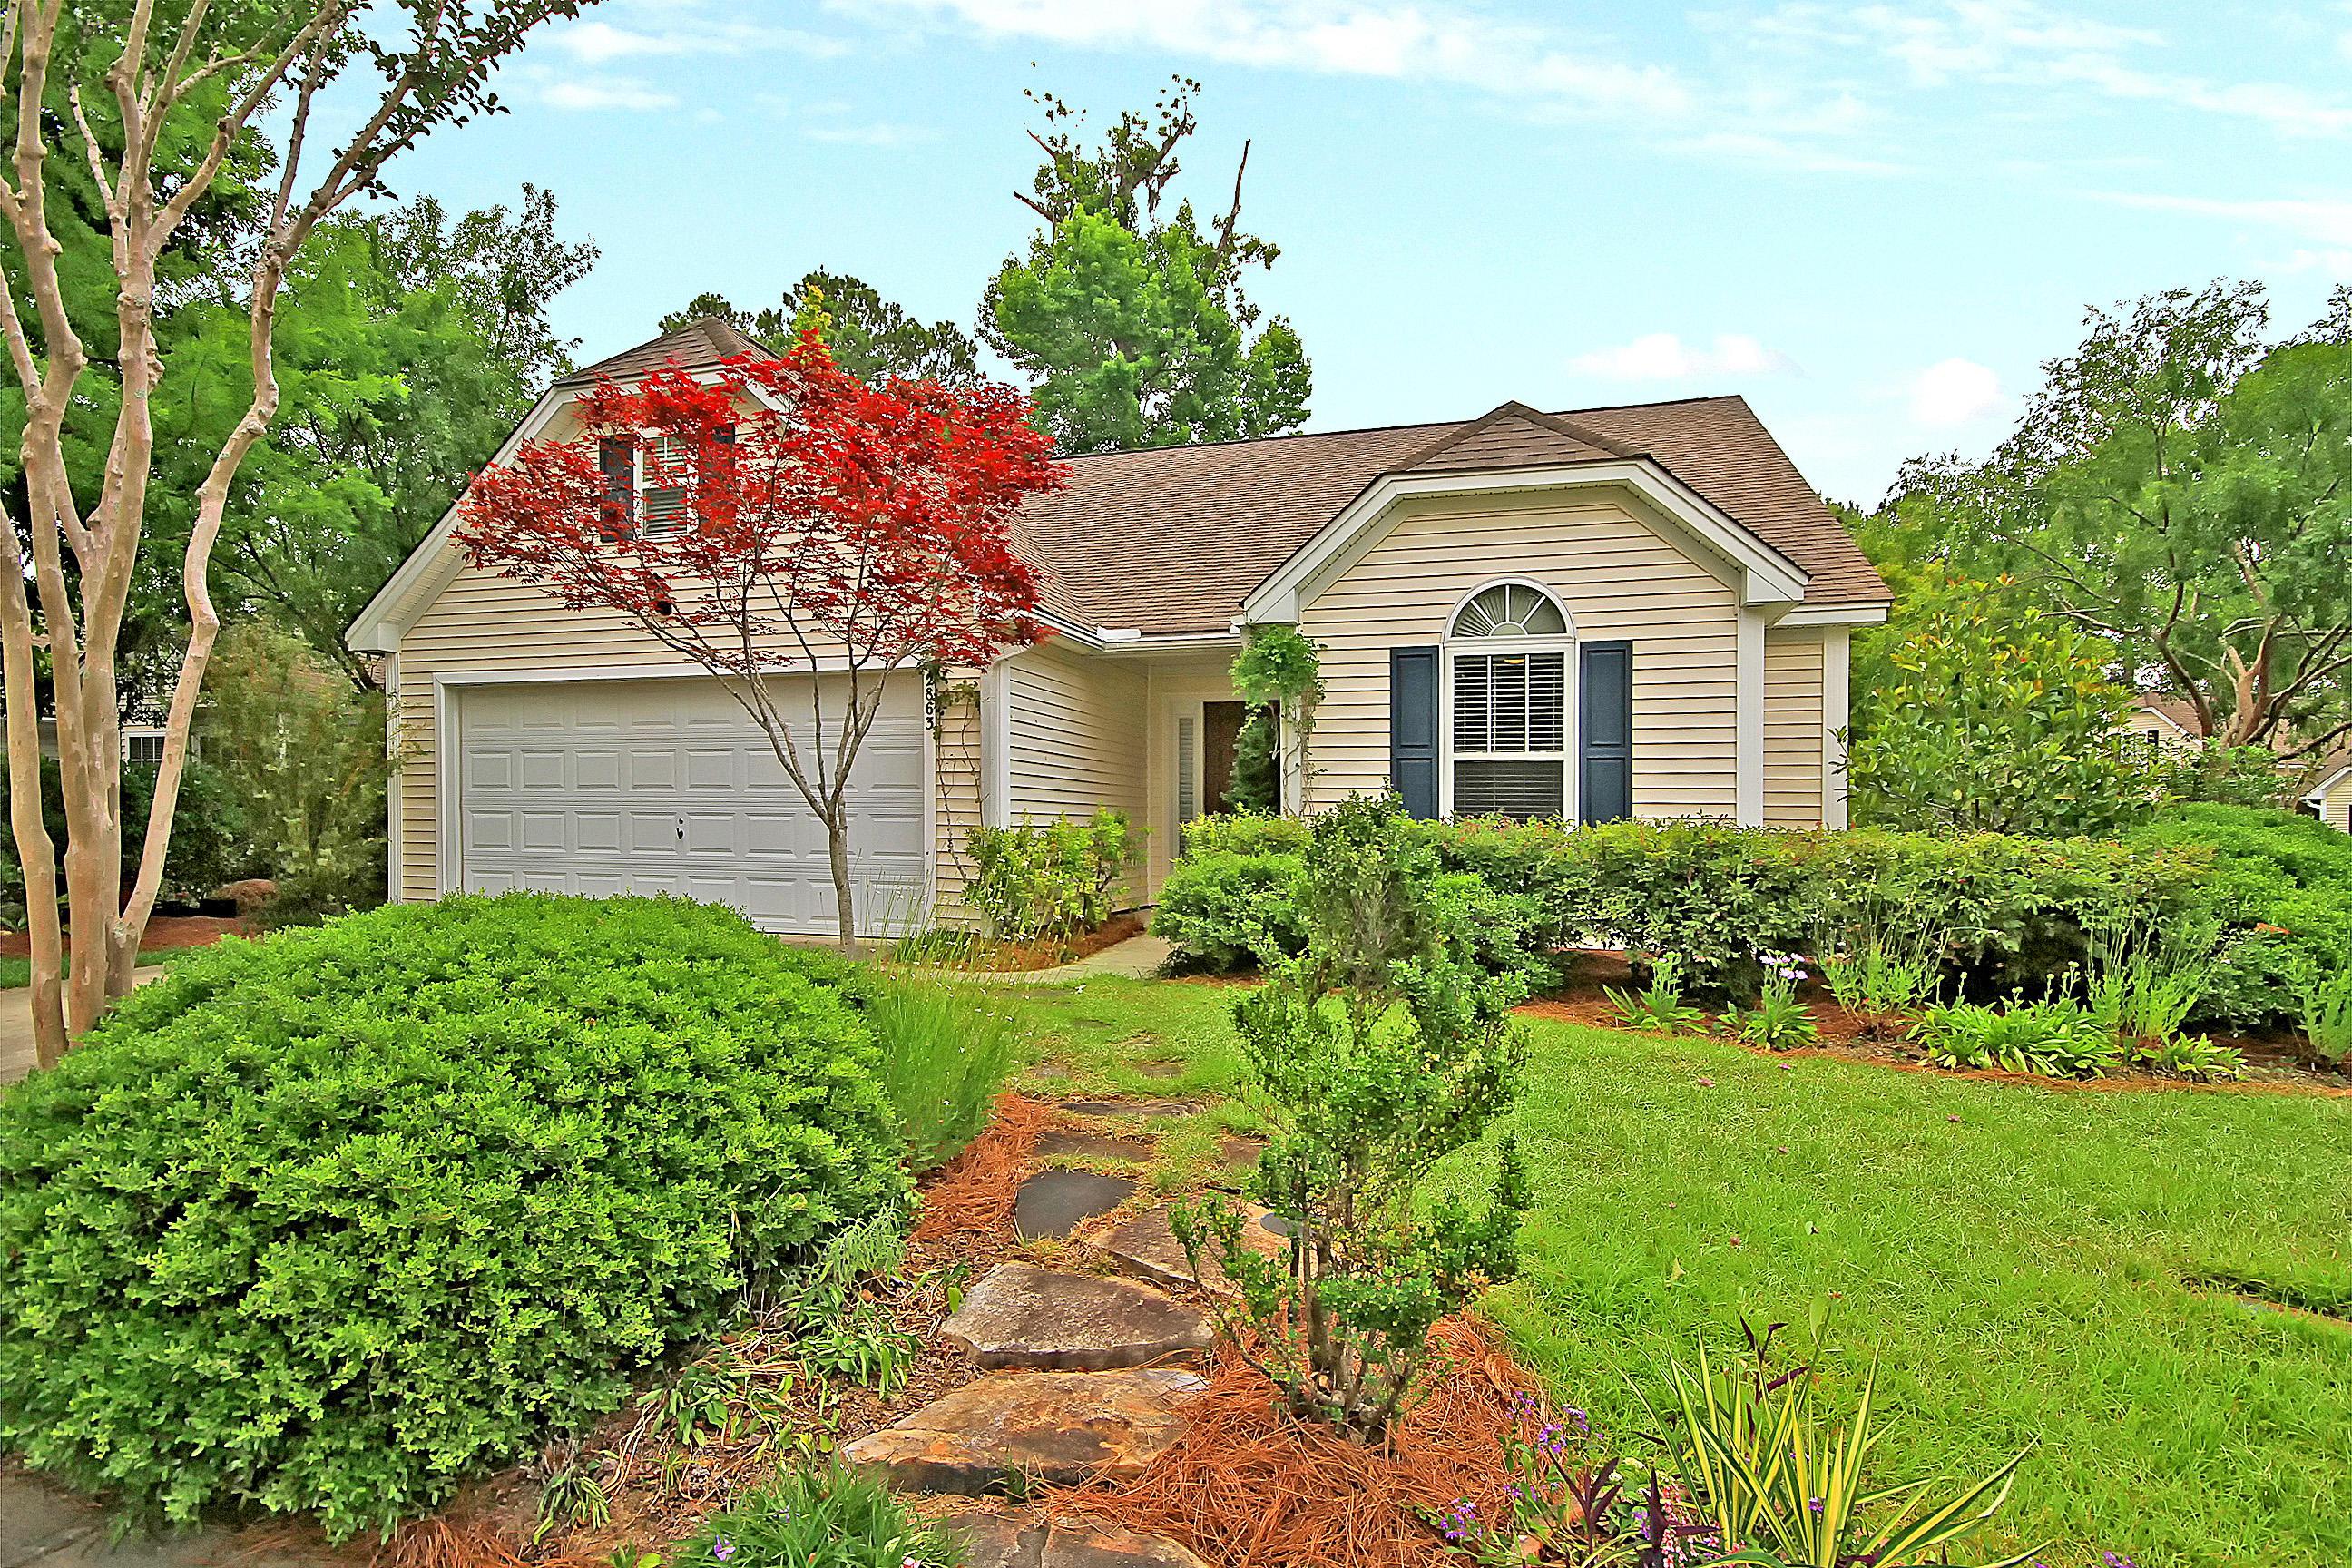 Planters Pointe Homes For Sale - 2863 Curran, Mount Pleasant, SC - 7